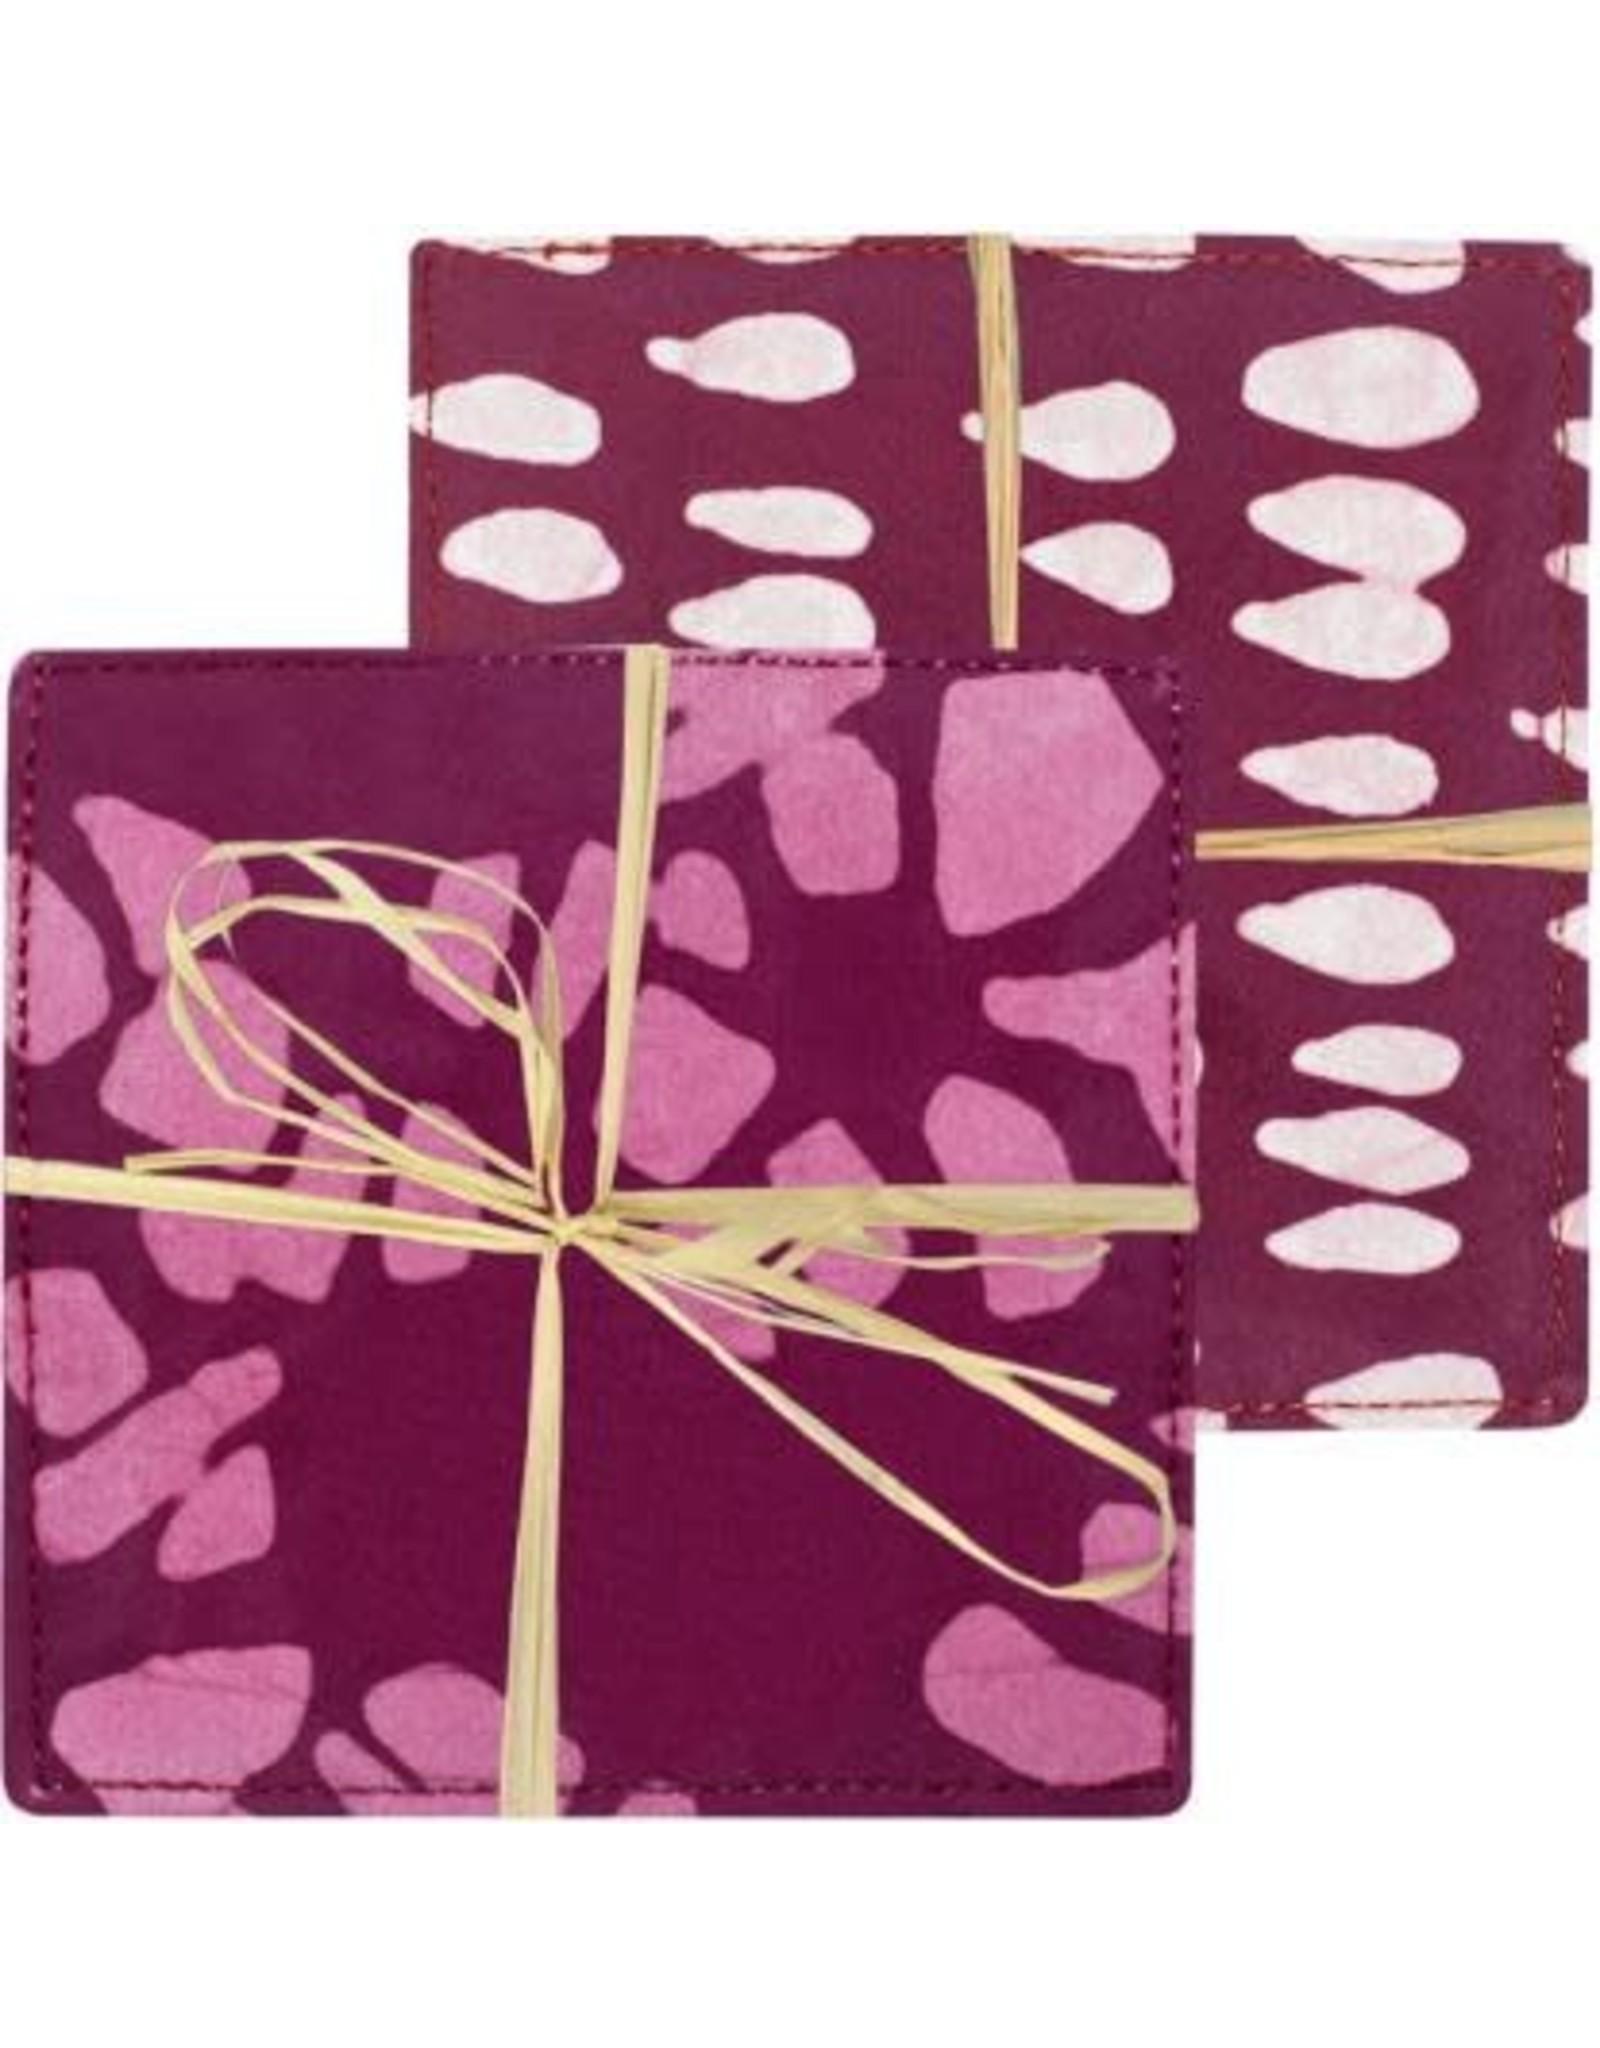 Batiked Coasters,